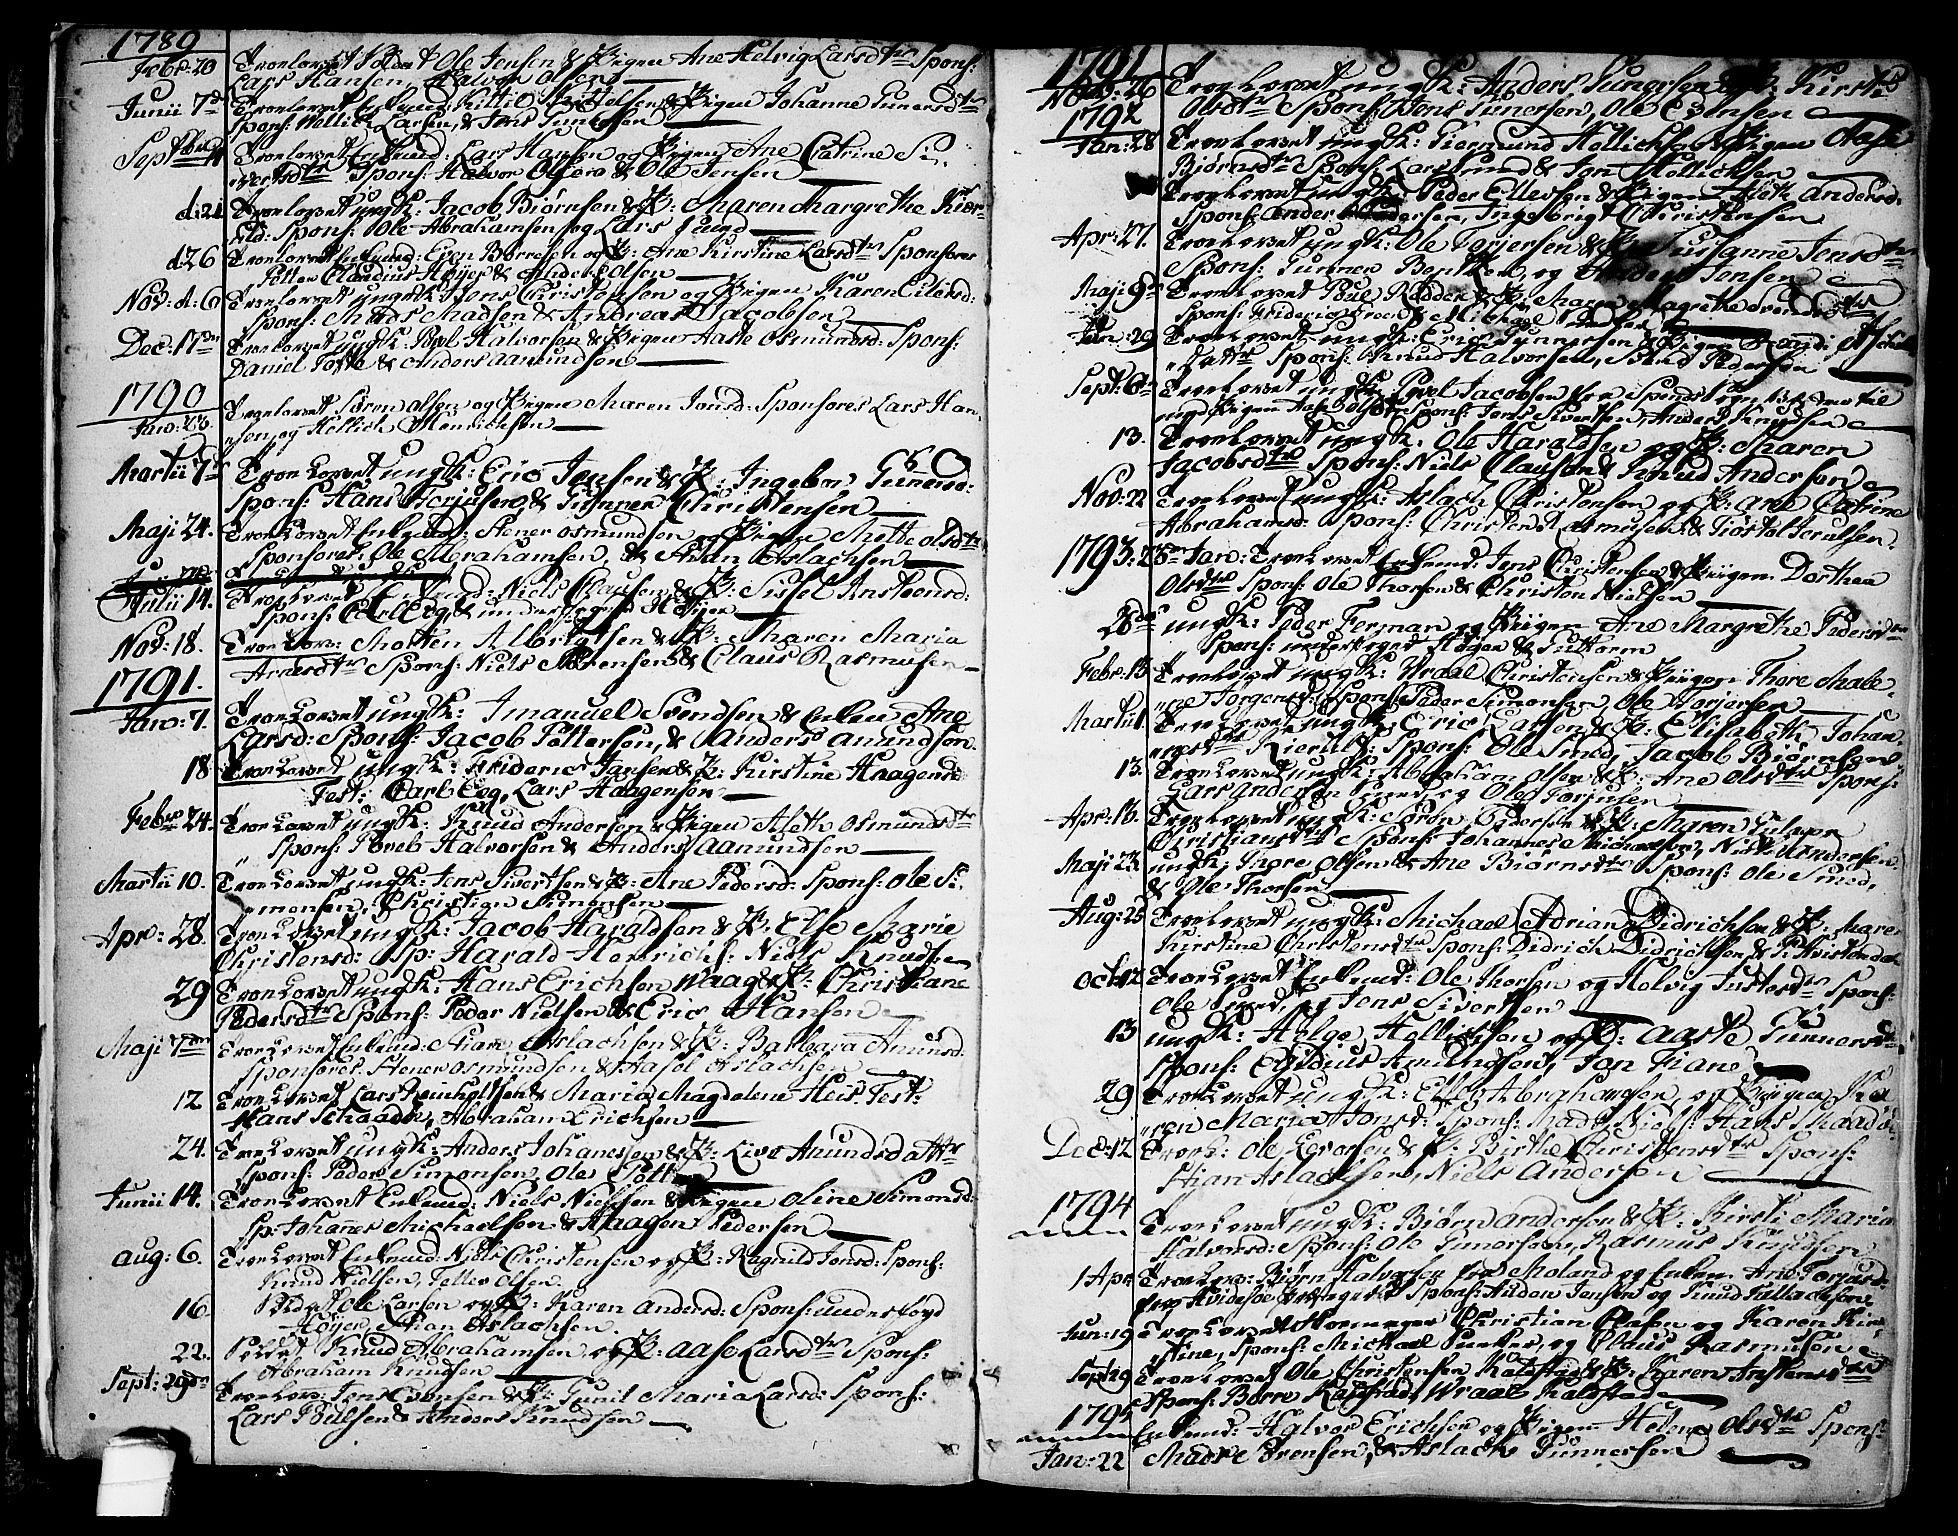 SAKO, Kragerø kirkebøker, F/Fa/L0002: Ministerialbok nr. 2, 1767-1802, s. 5